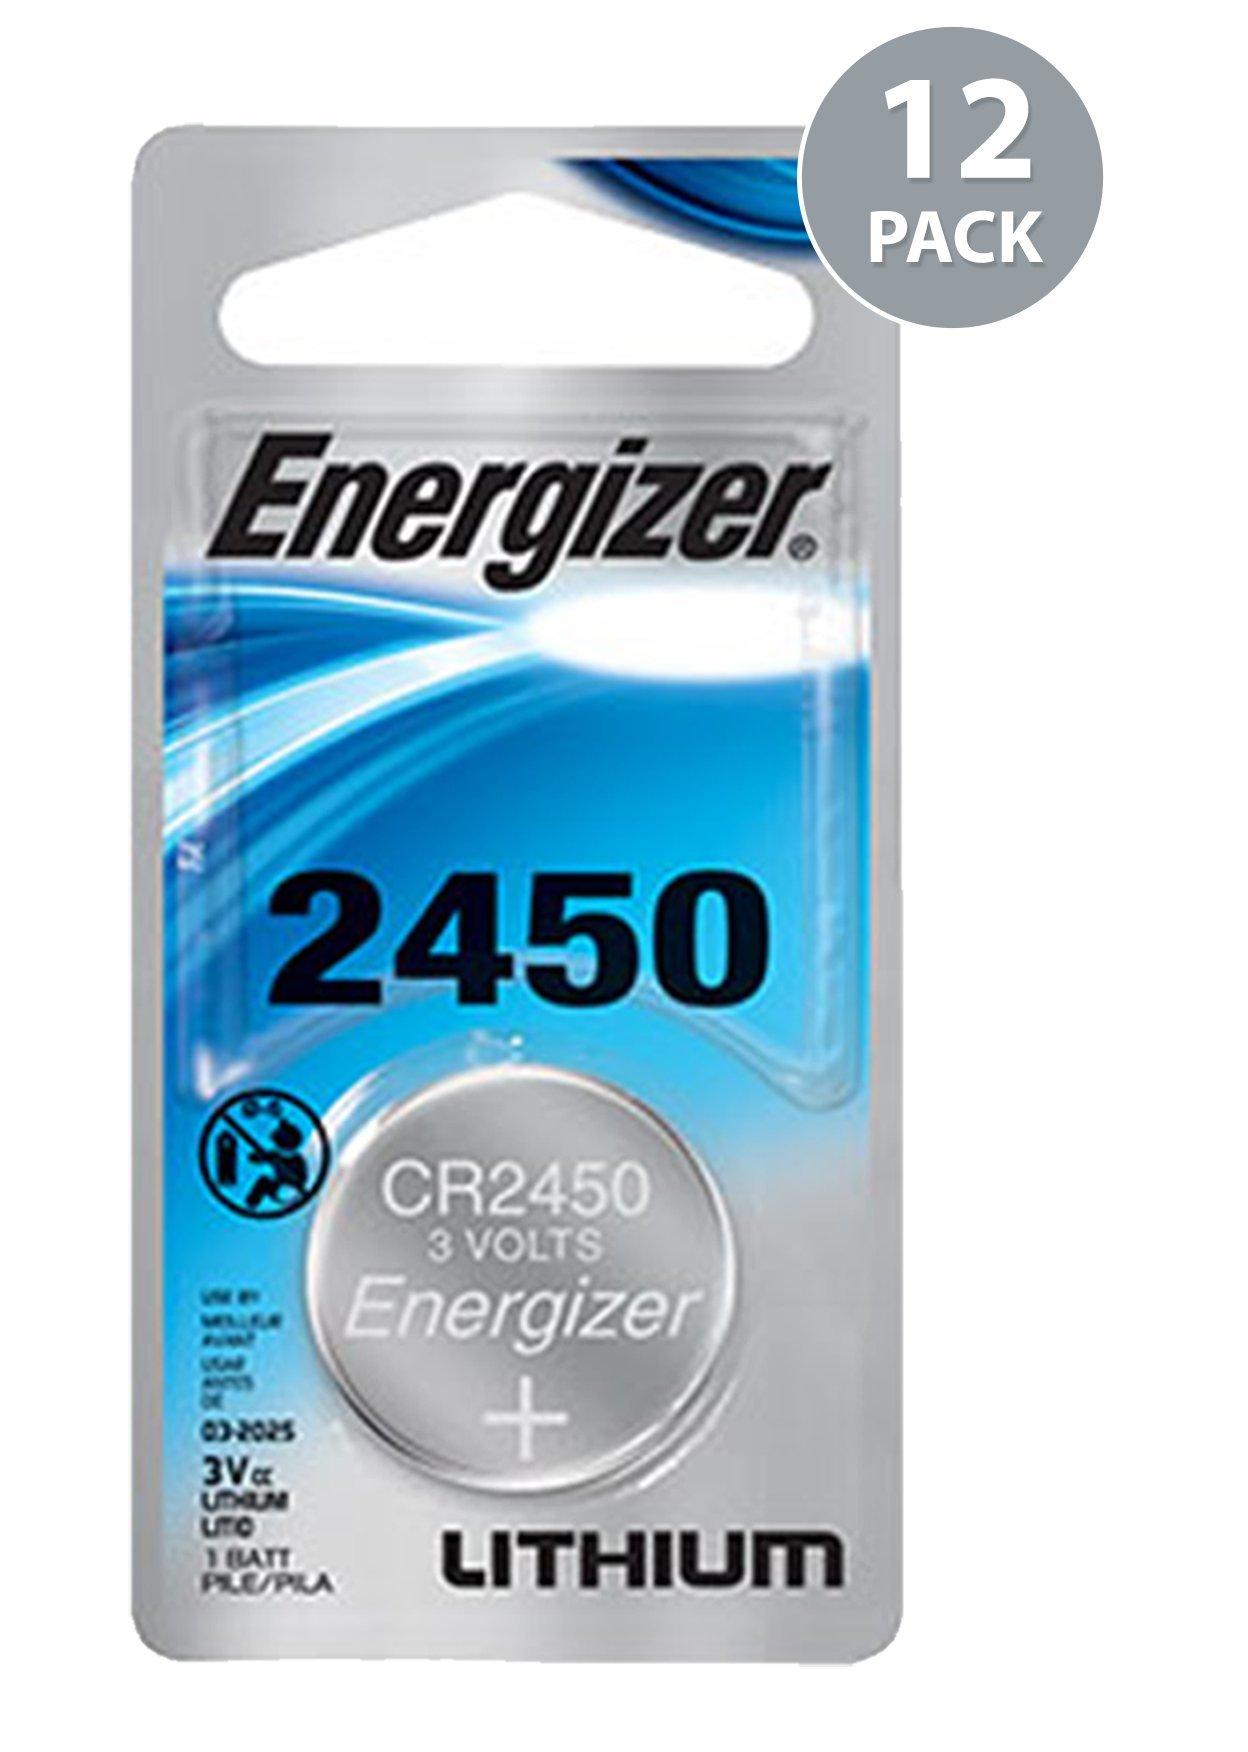 Energizer CR2450 Lithium Battery, 3v ECR2450, 12 PK by Energizer